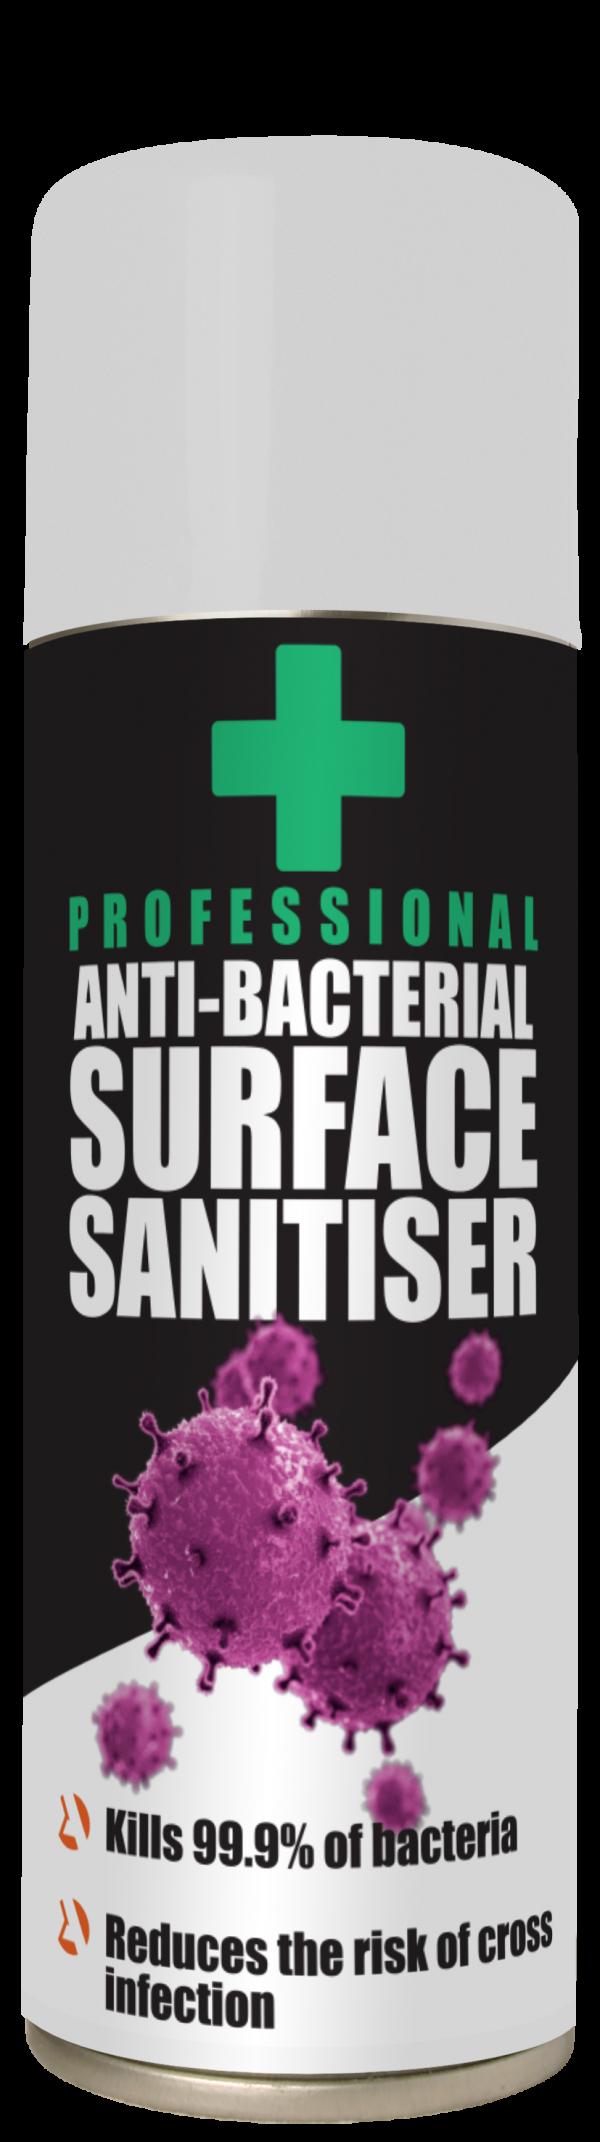 anti-bacterial sanitiser